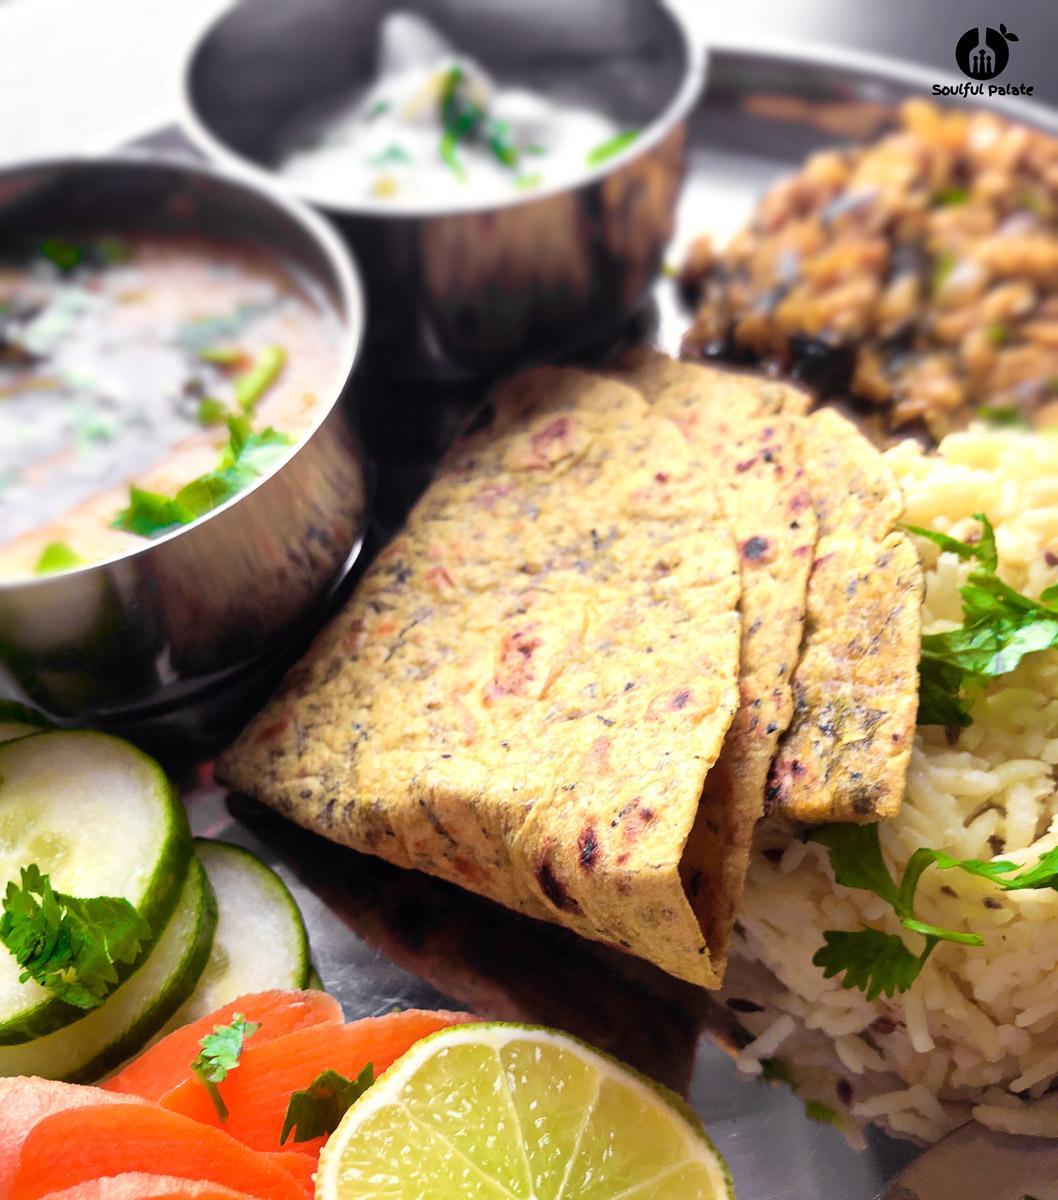 Nourishing Indian meal